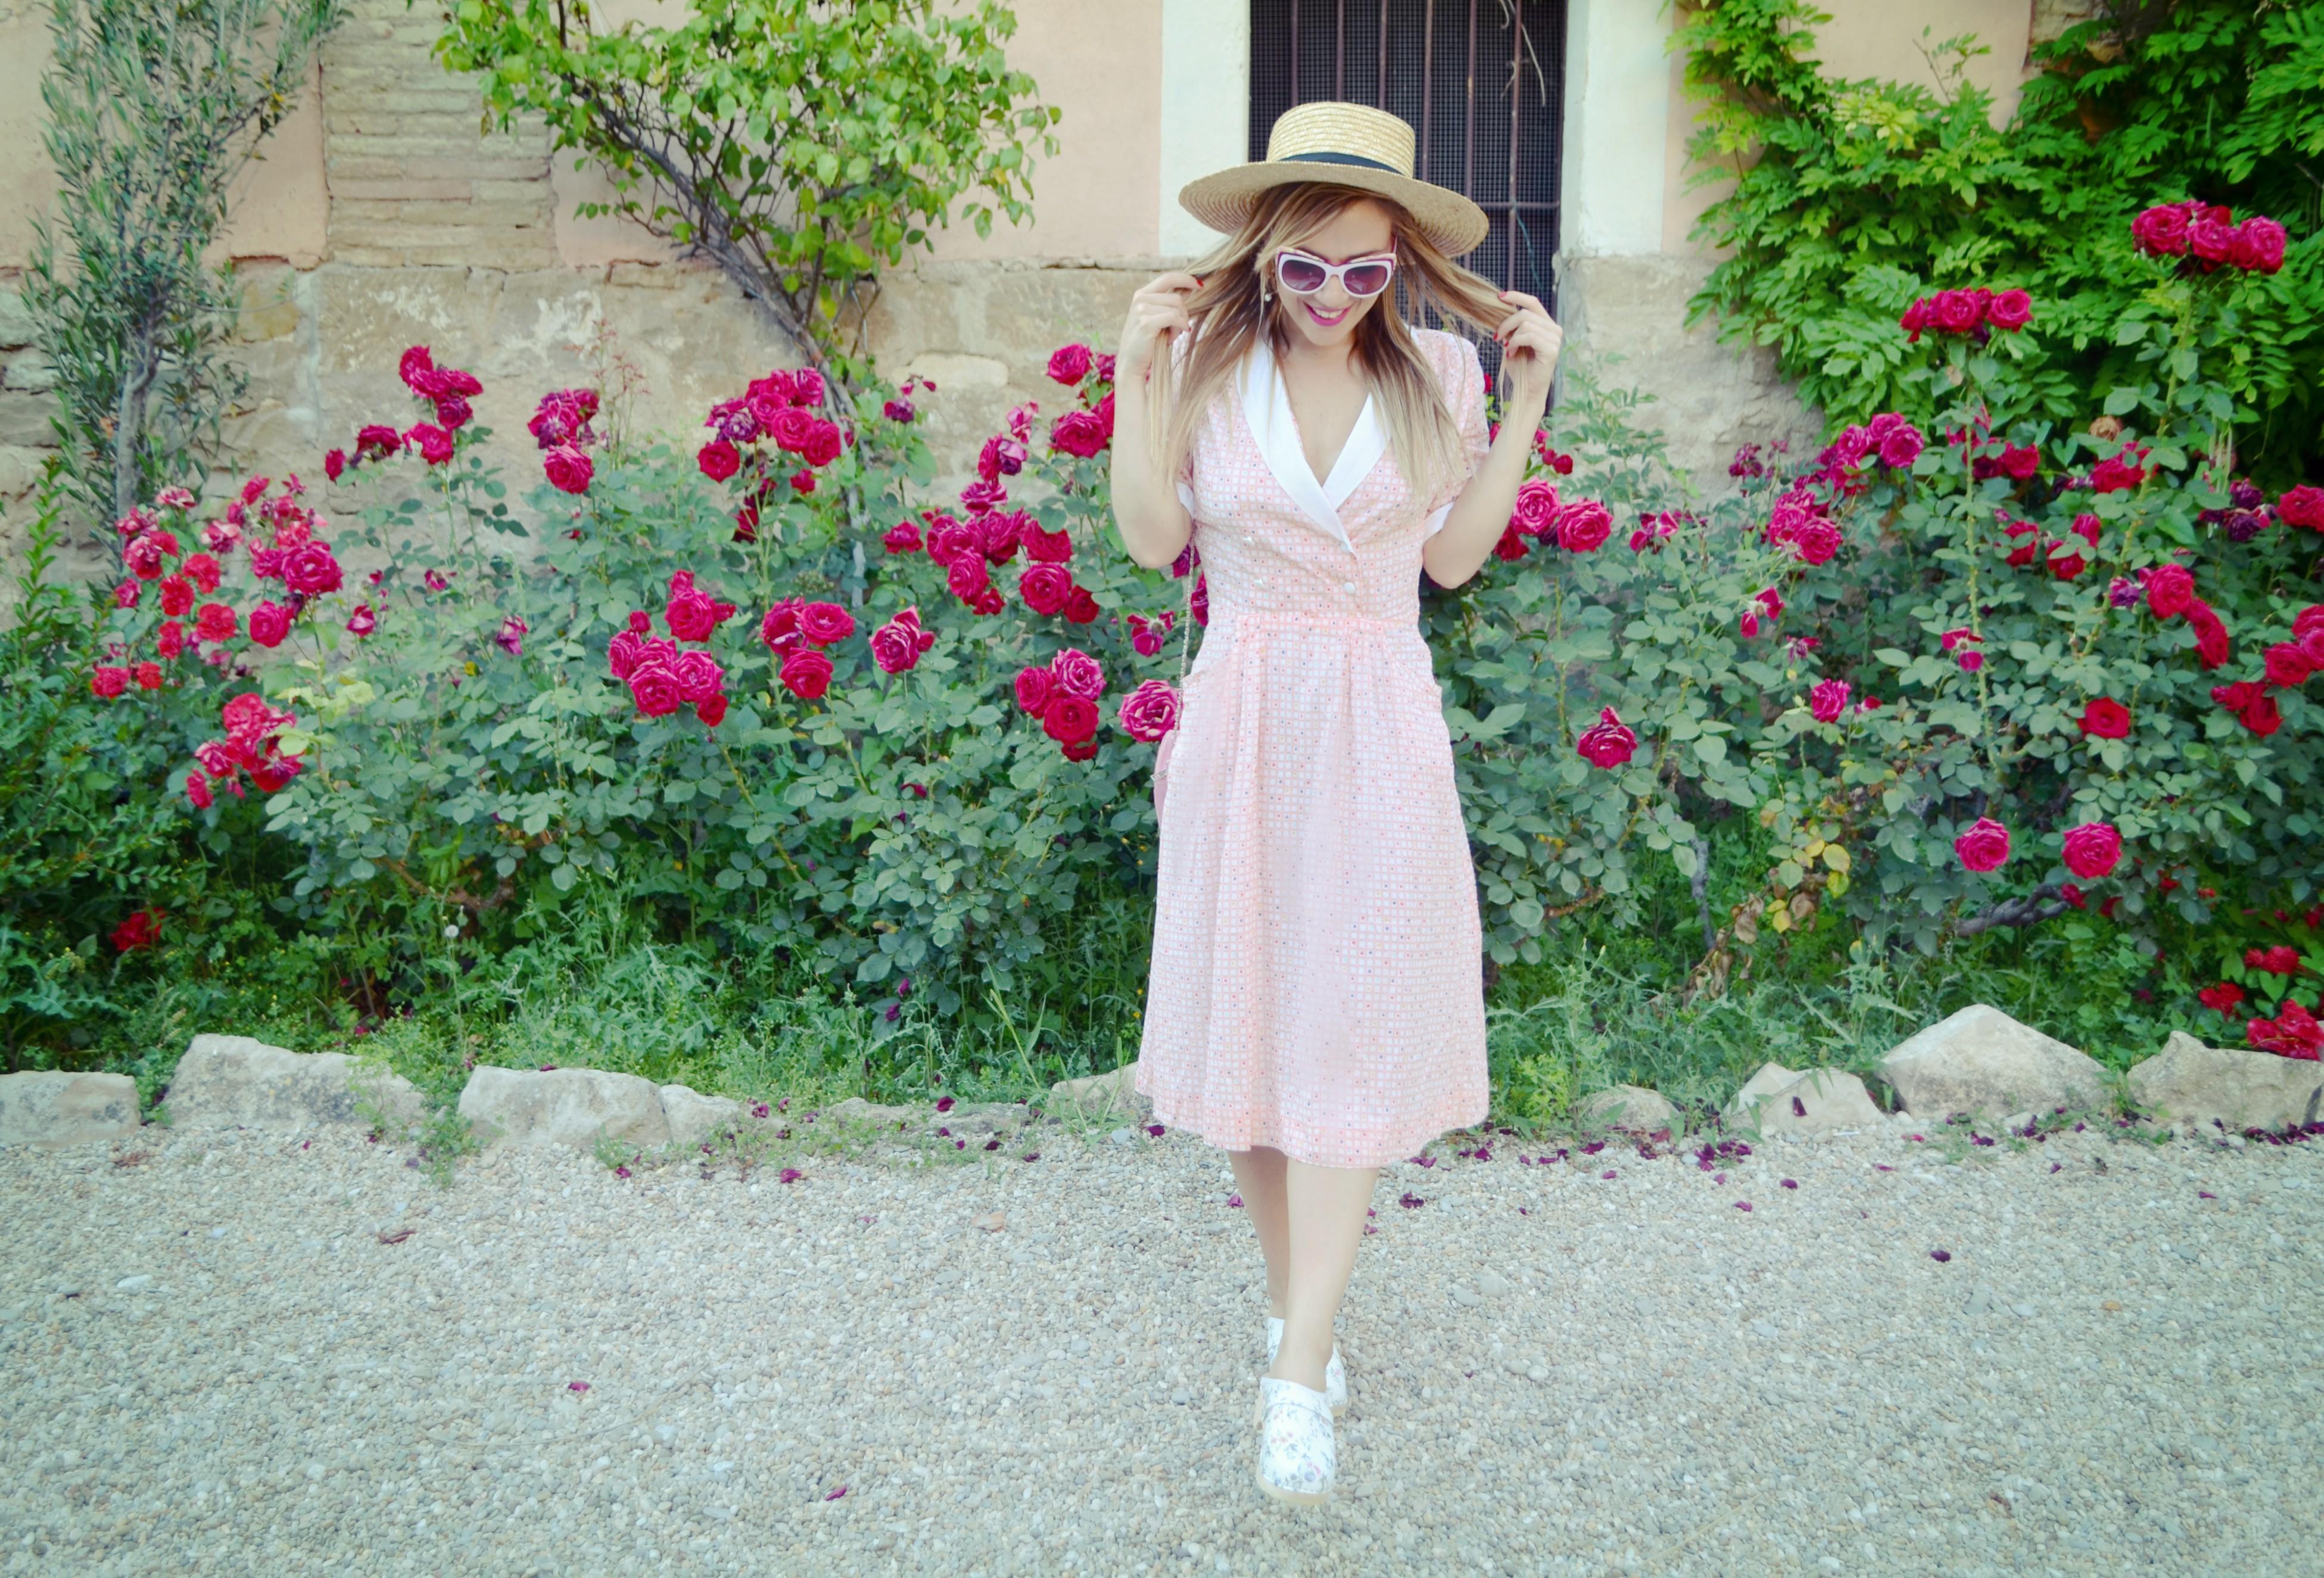 Fashionista-ChicAdicta-blog-de-moda-viaje-influencers-florette-Chic-Adicta-vestidos-de-flores-agatharuizdelaprada-sunglasses-PiensaenChic-Piensa-en-Chic